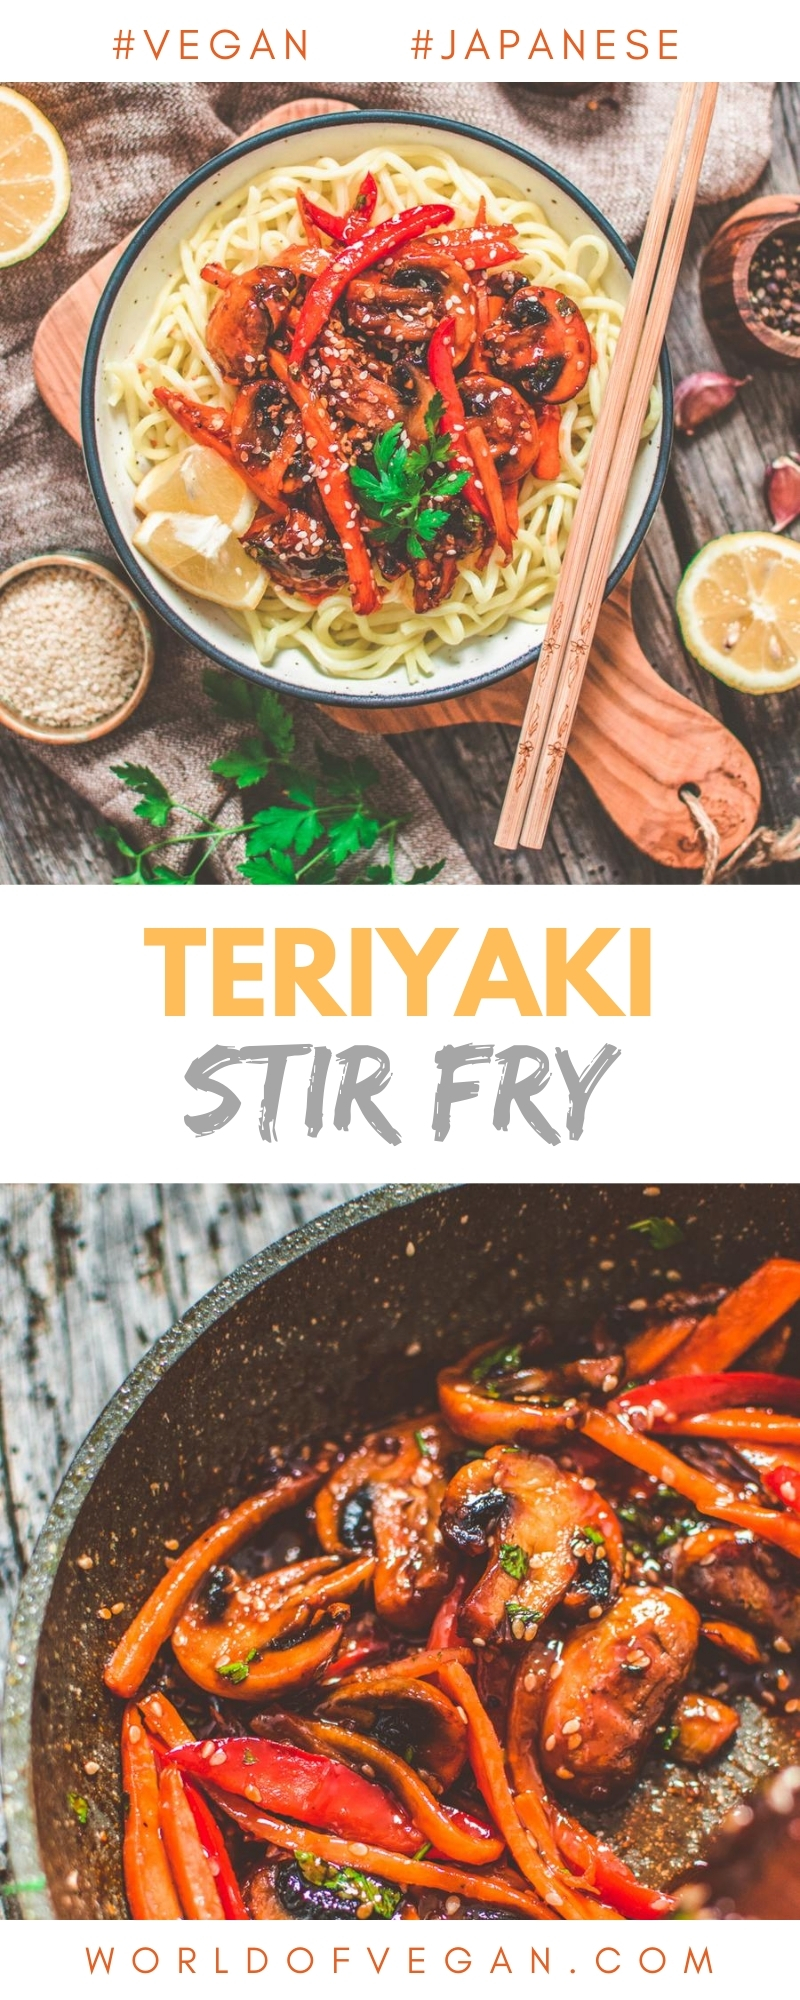 Vegan Teriyaki Stir Fry Long Pinterest Image